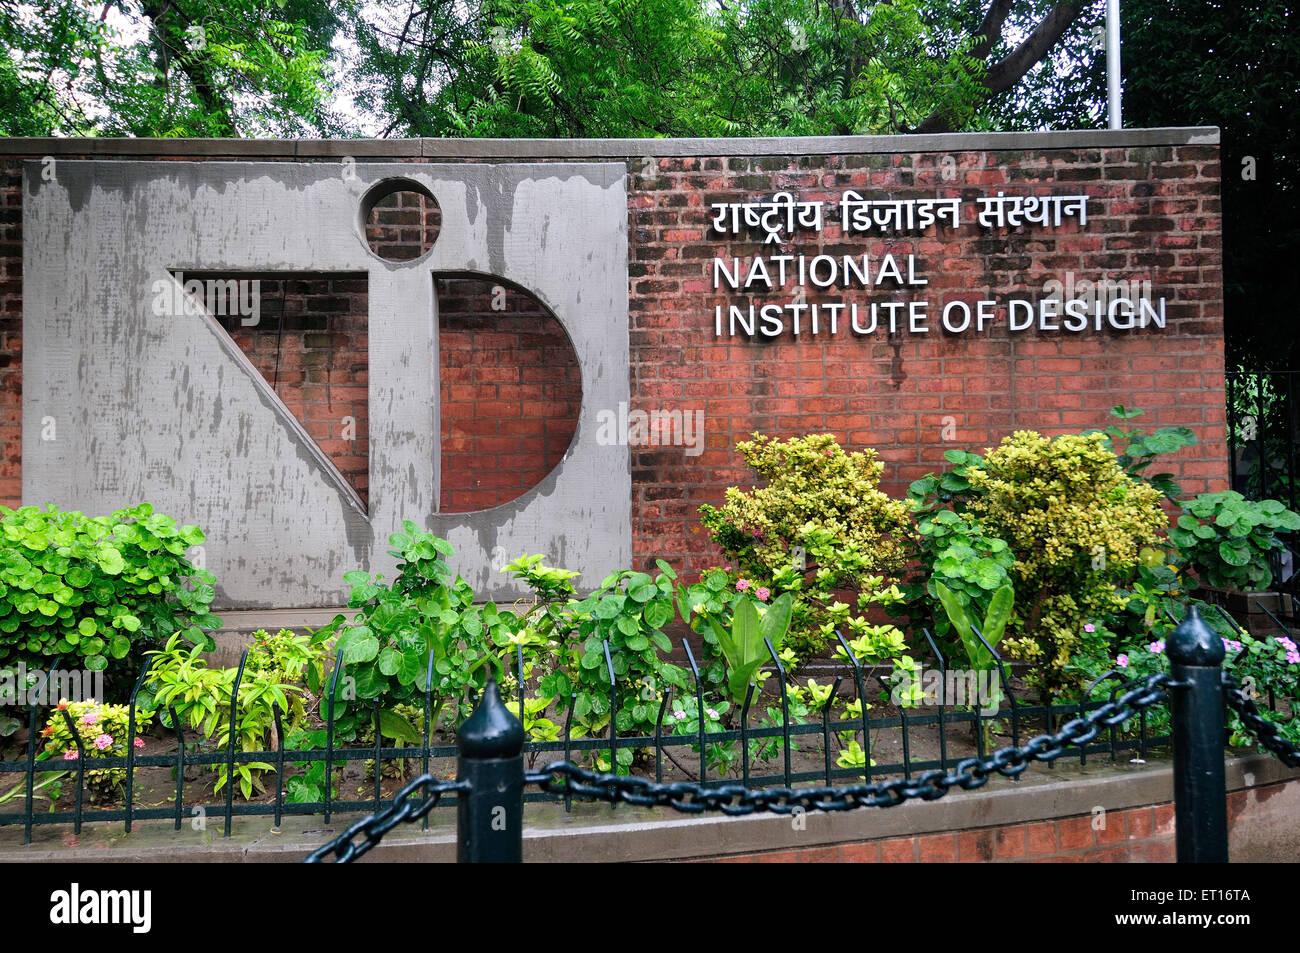 National Institute of Design Ahmedabad Gujarat India Asia - Stock Image